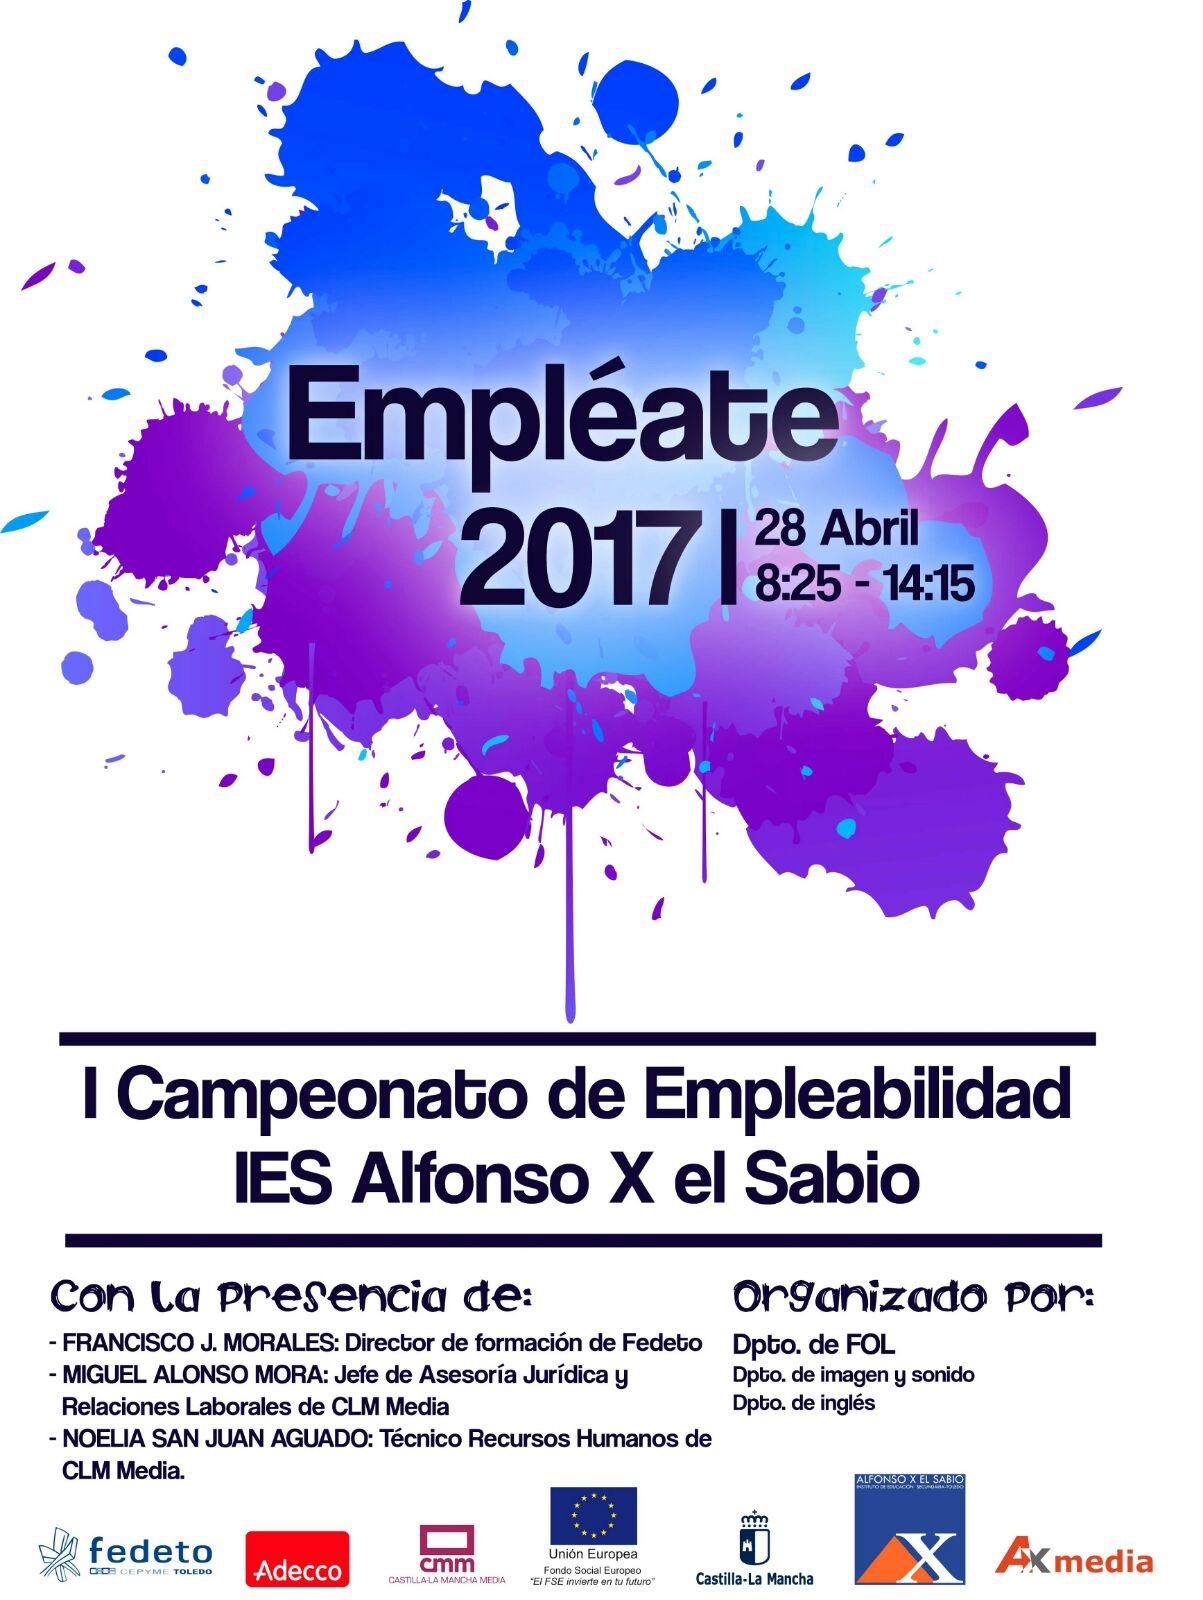 """Empléate 2017"". I Campeonato de Empleabilidad del IES Alfonso X el Sabio"